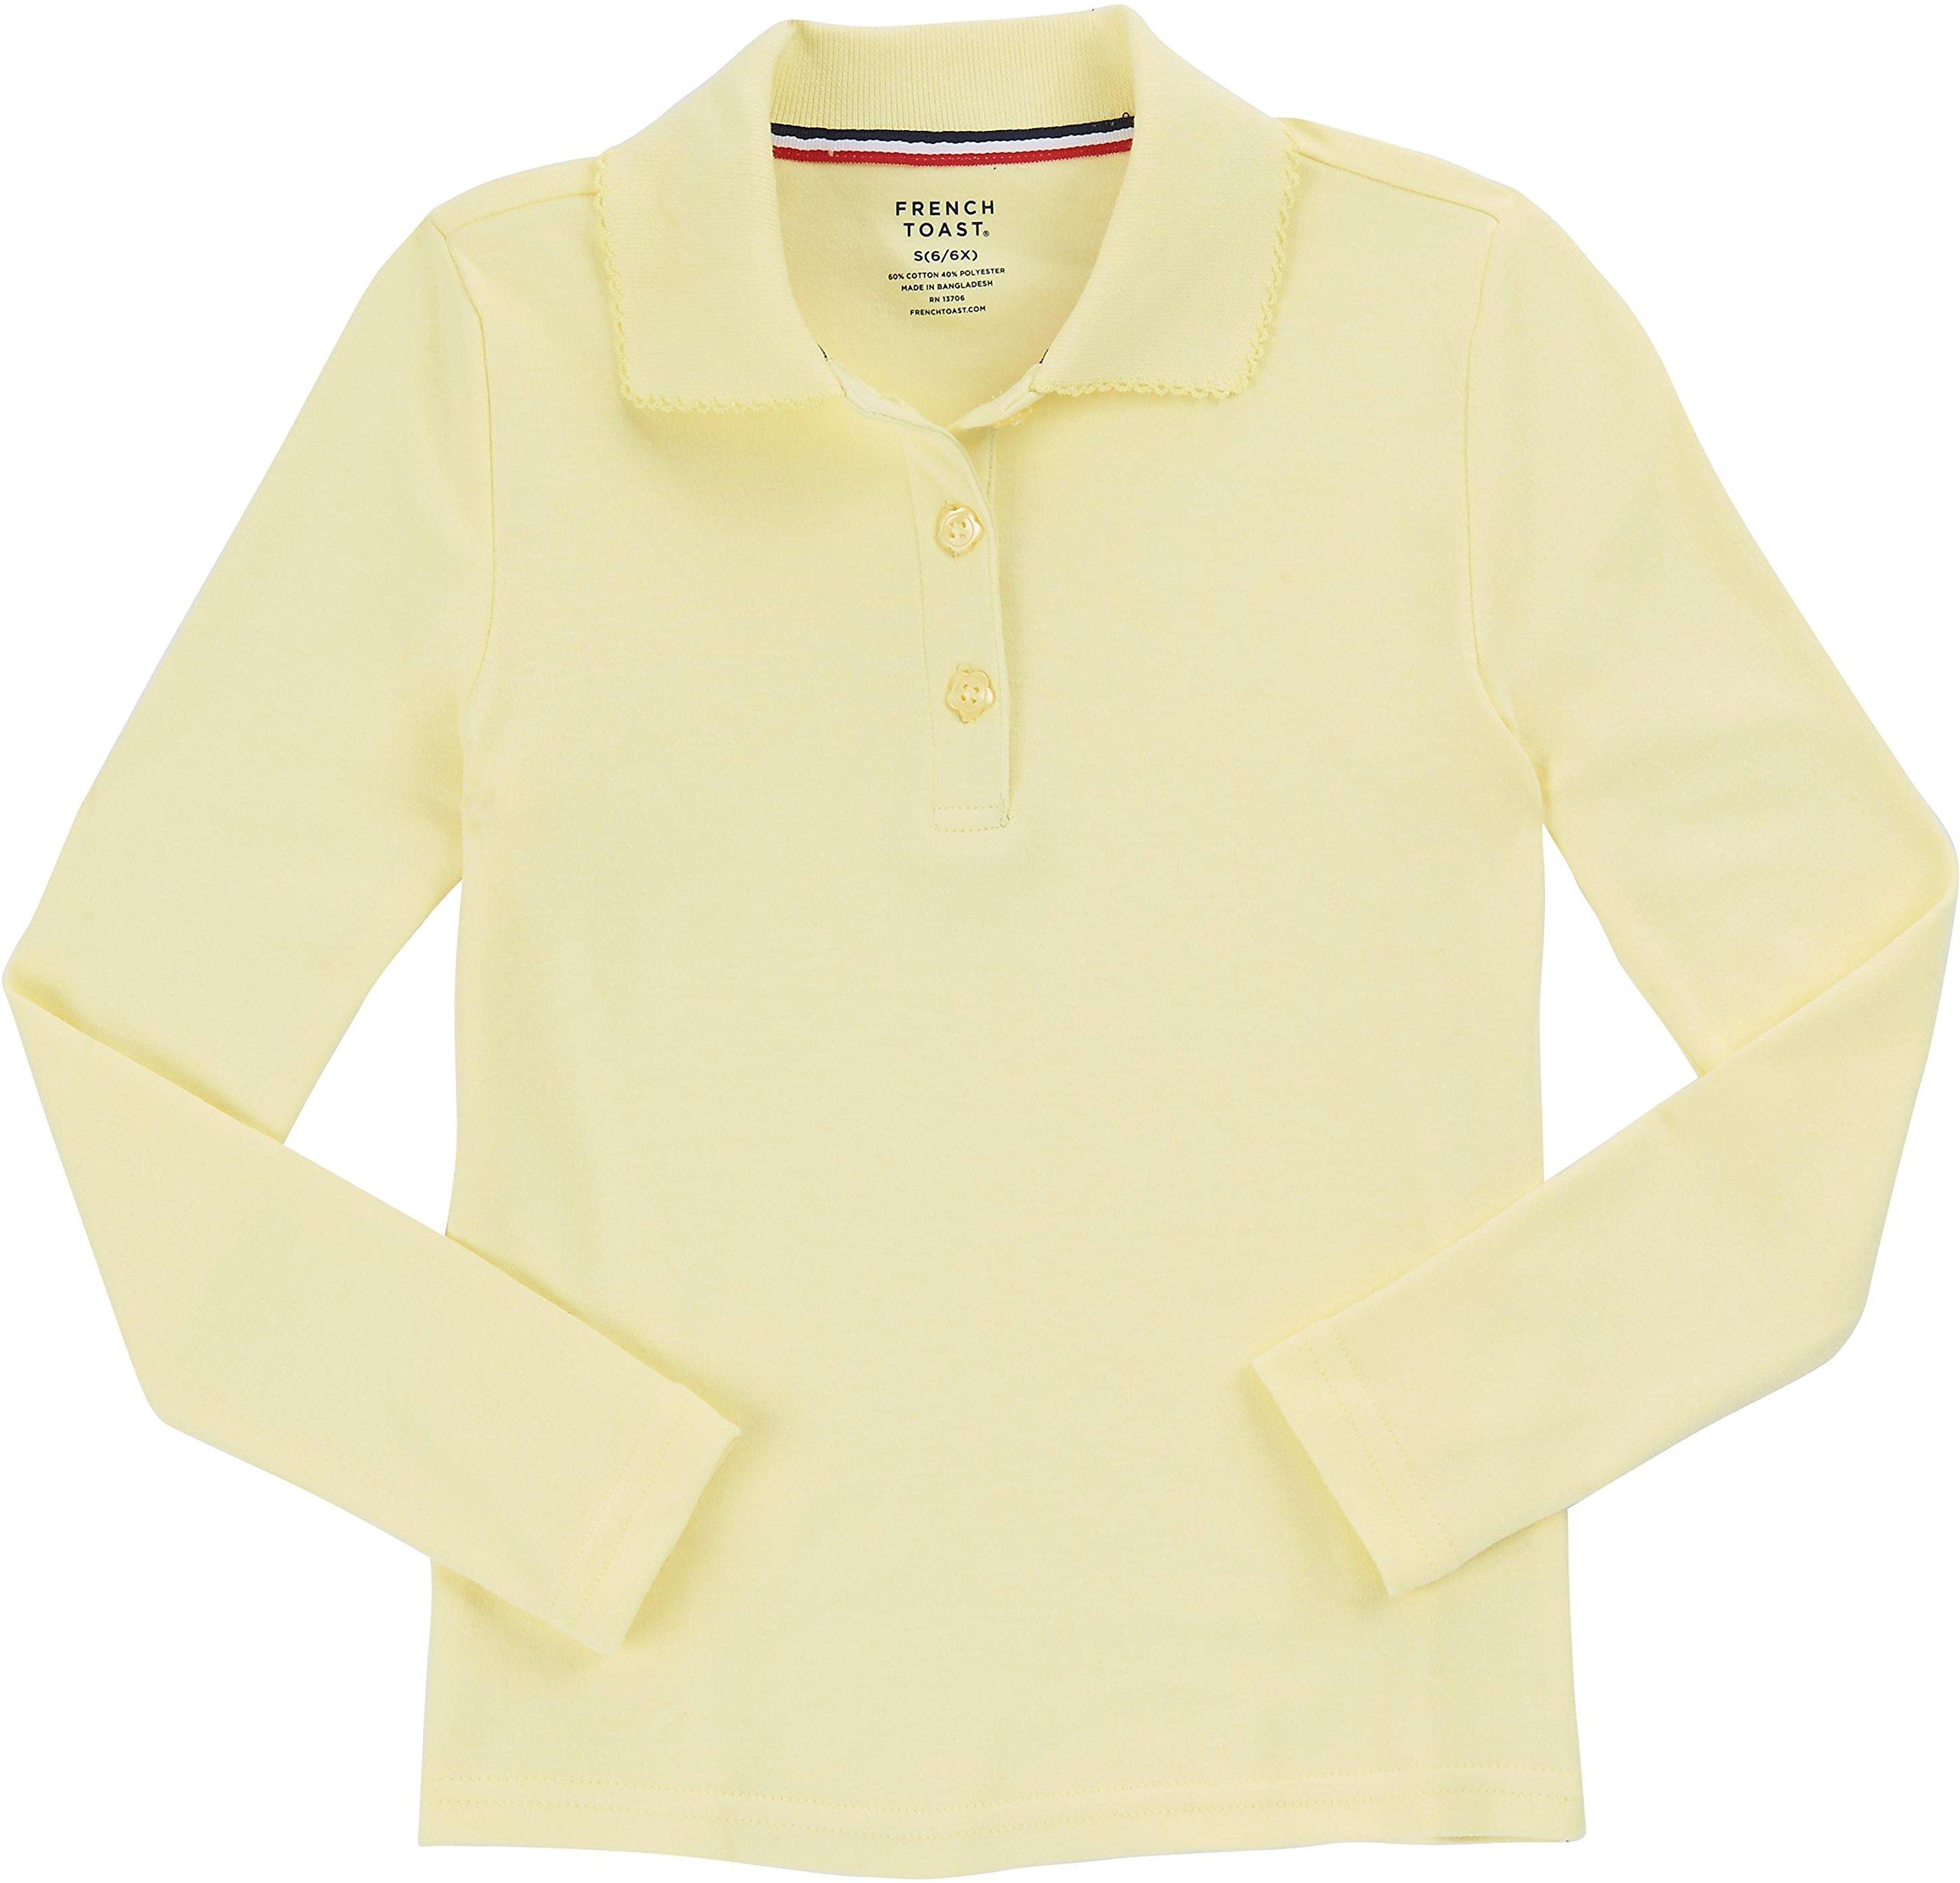 French Toast School Uniform Girls Long Sleeve Polo Interlock with Picot Collar, Yellow, XX-Large (18/20)